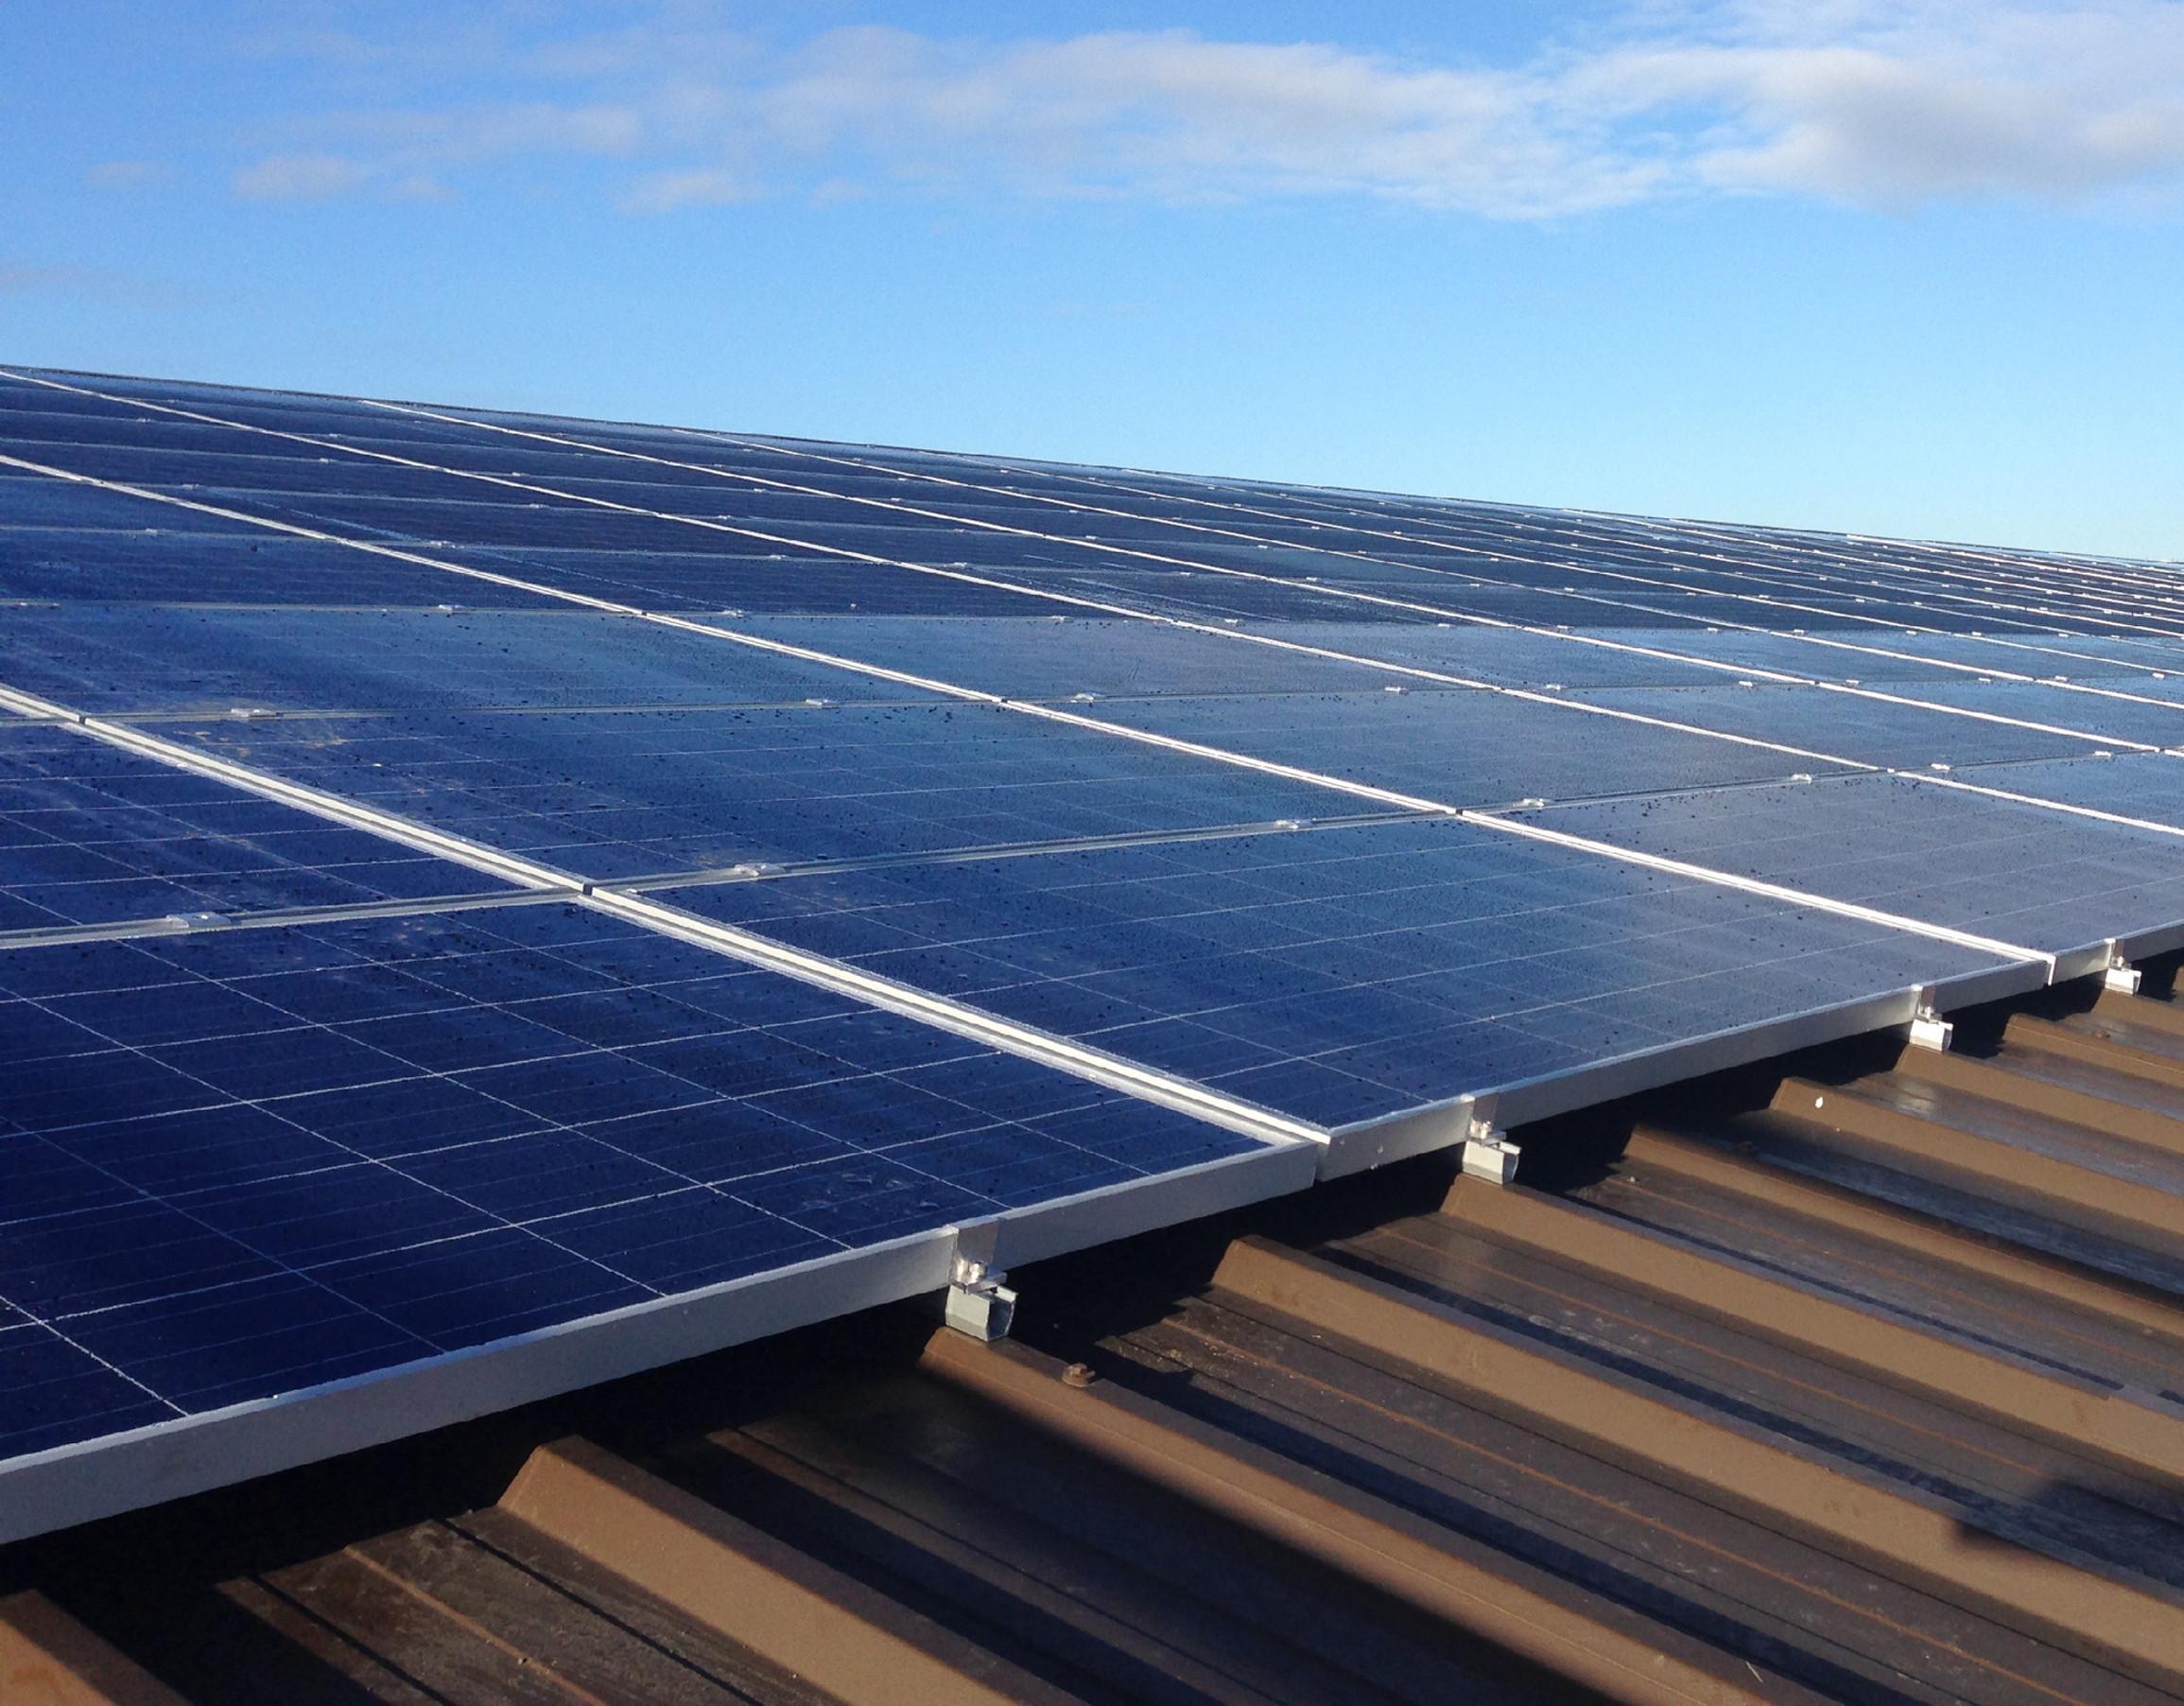 Pv Solar Panels Igloo Environmental Ltd Braintree